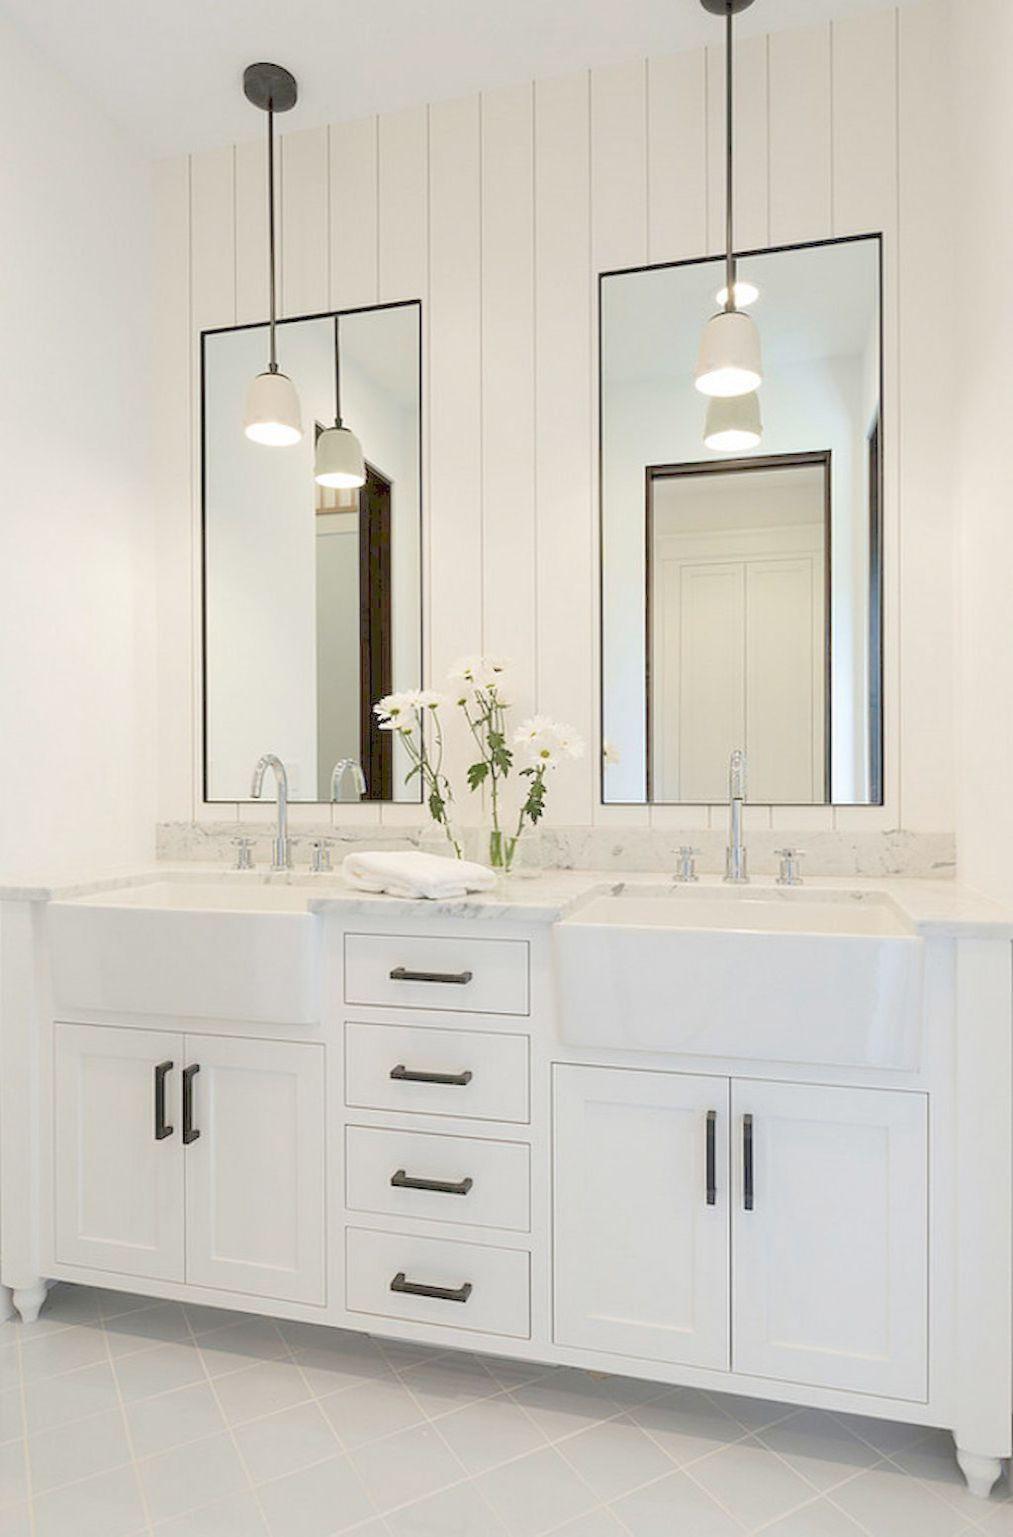 Pin On Stylish Bathrooms [ 1537 x 1013 Pixel ]